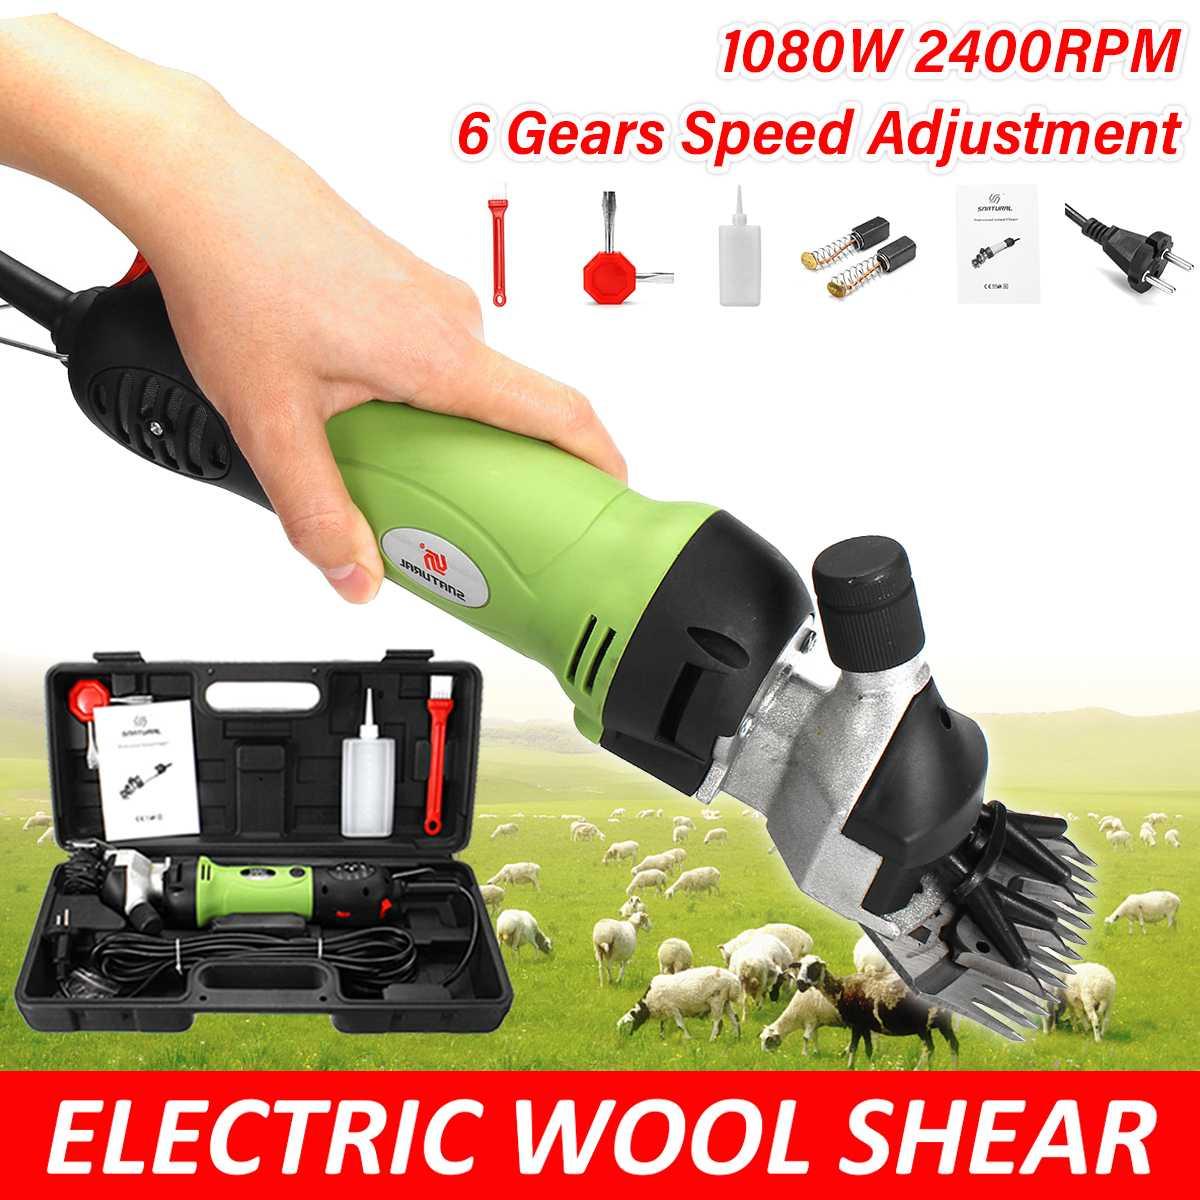 220V 1080W 6 Gears Speed Electric Sheep Goat Shearing Machine Clipper Farm Sheep Goat Shears Cutter Wool Scissor Cut Machine